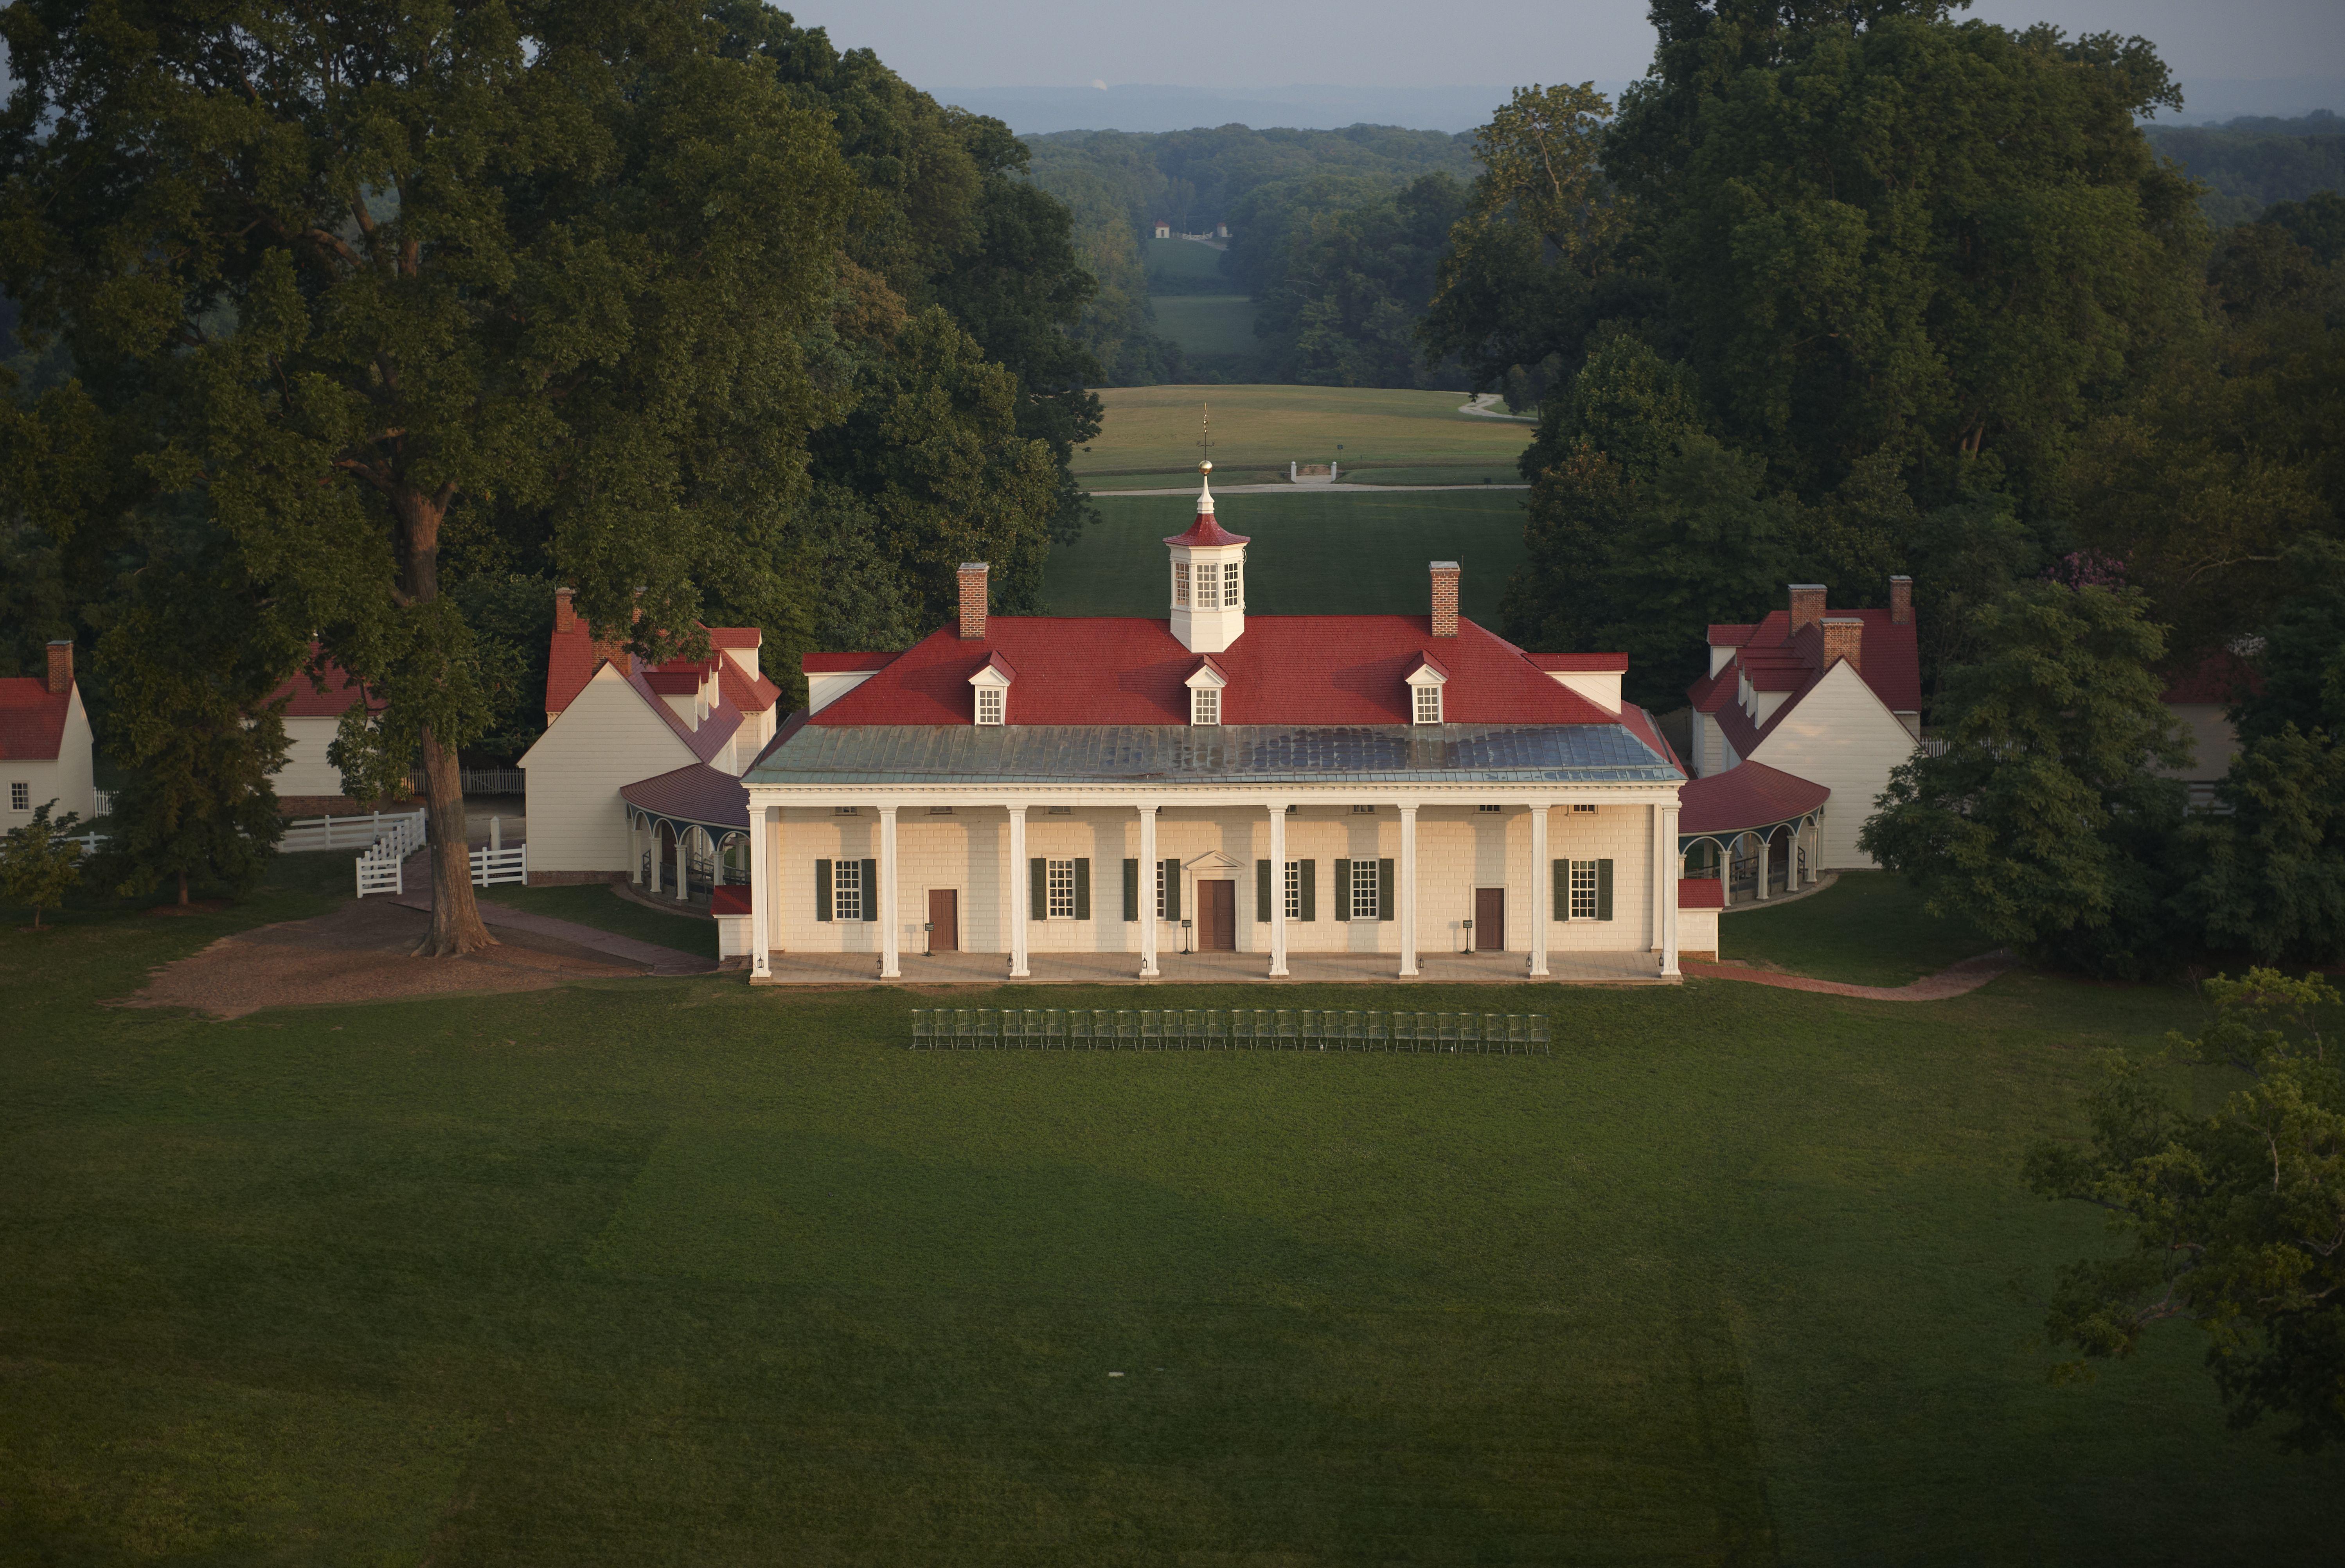 Aerial view of the Mount Vernon Estate